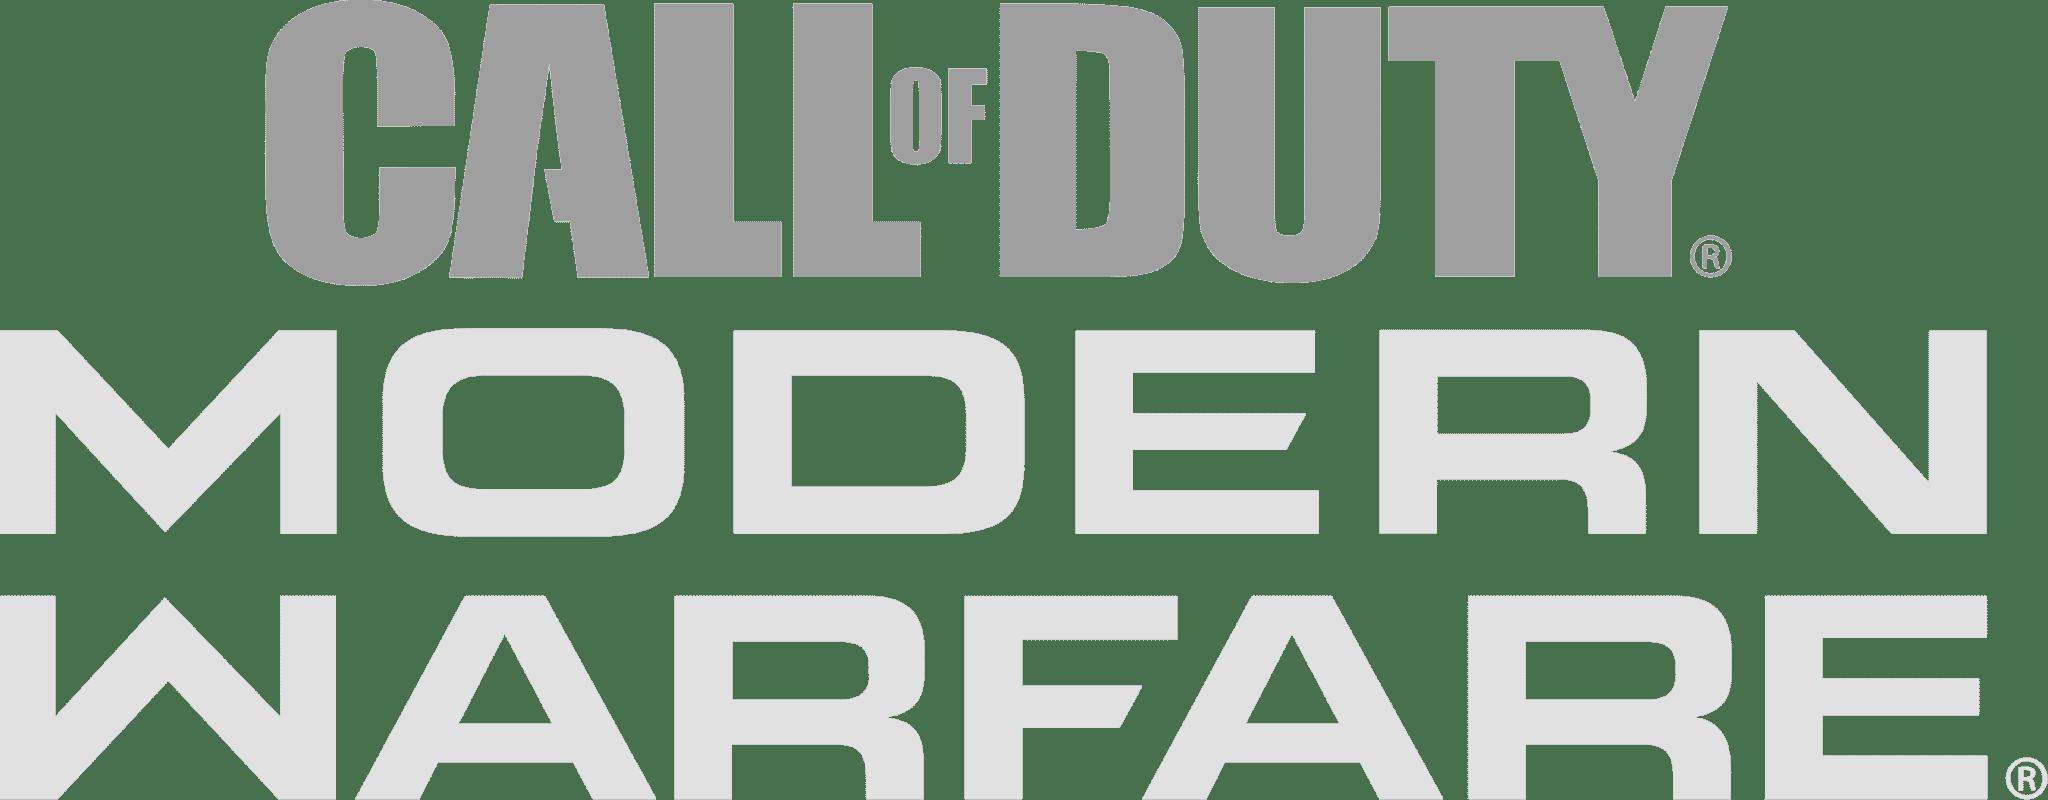 Call of Duty: Modern Warefare Logo